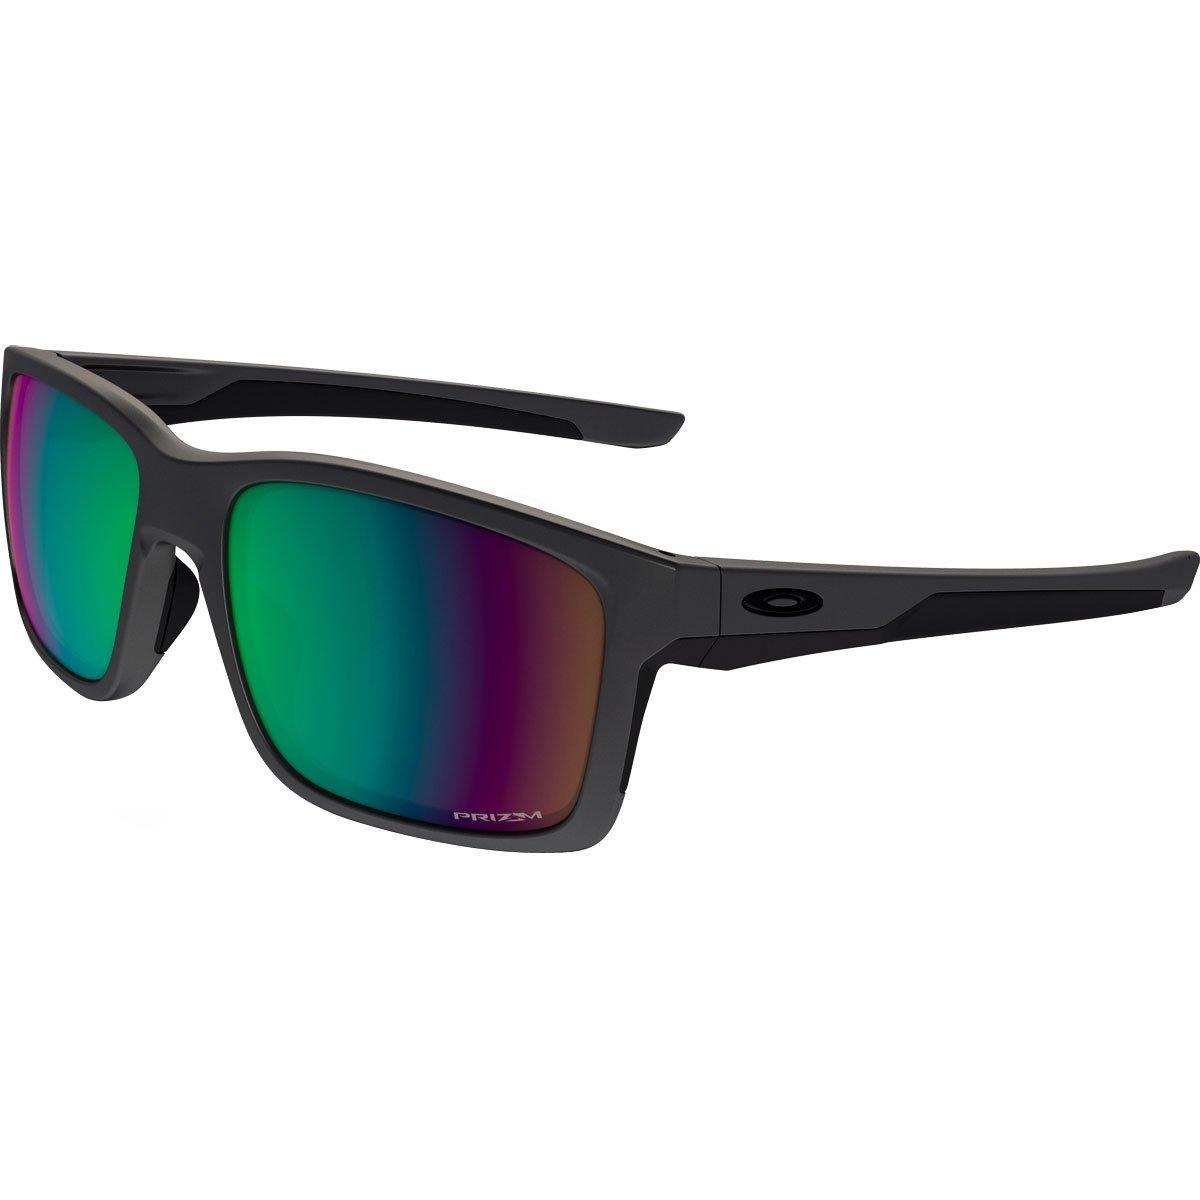 Oakley Mens Mainlink Polarized Sunglasses, Steel/Prizm Shallow Water, One Size